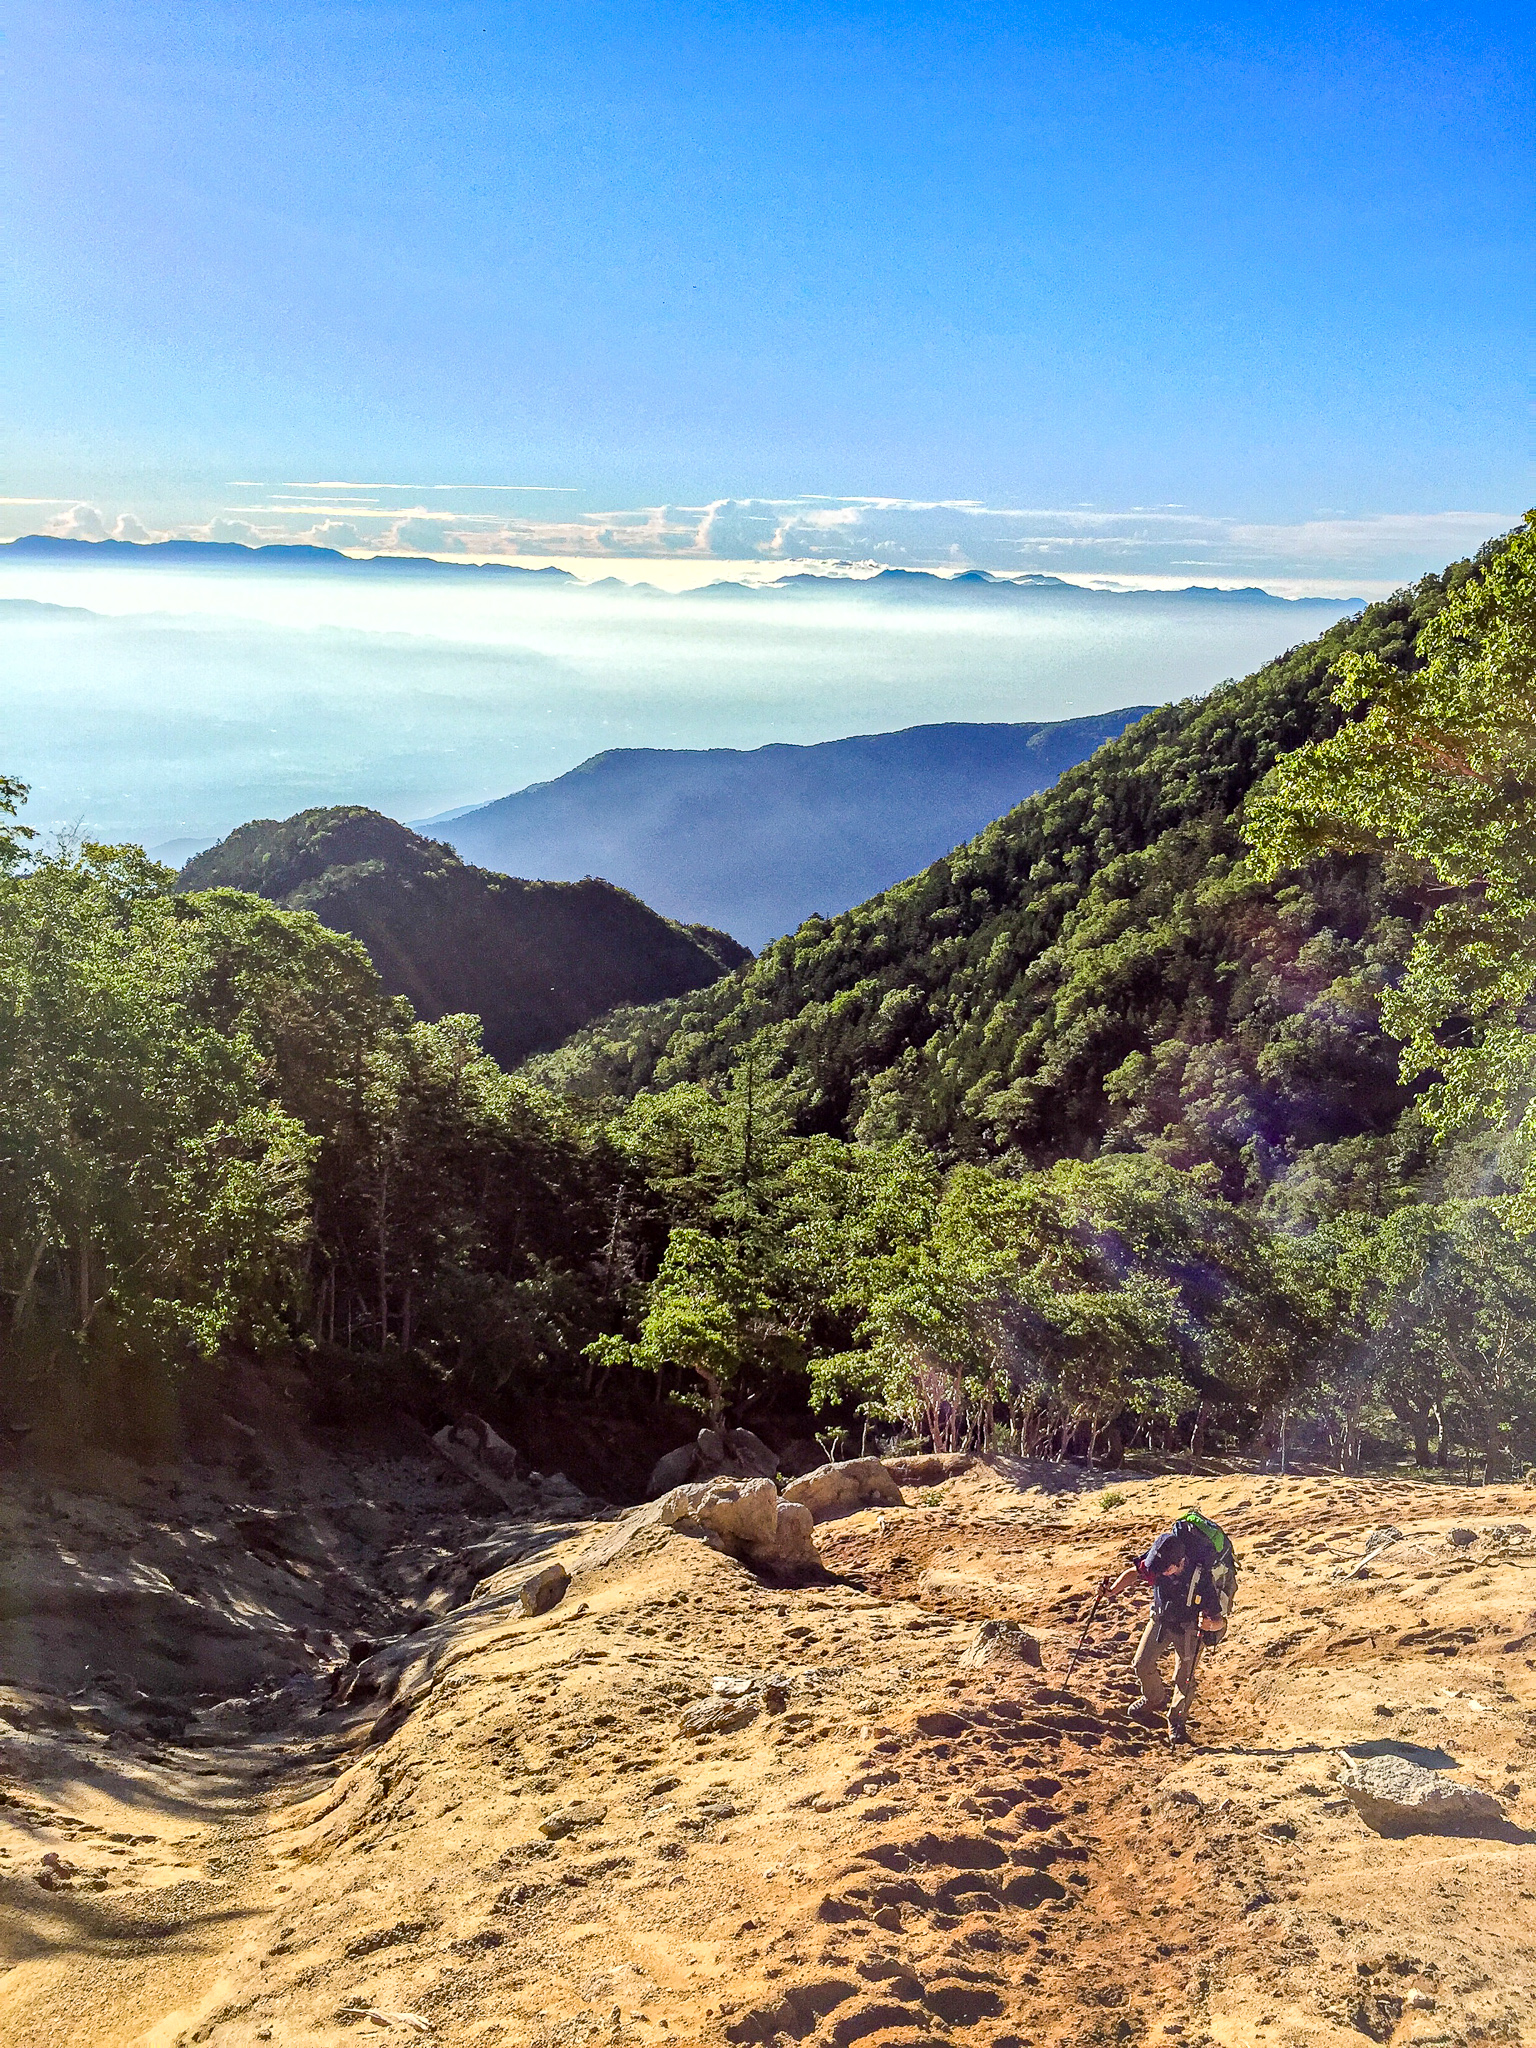 鳳凰三山・地蔵岳頂上付近は砂場の急登